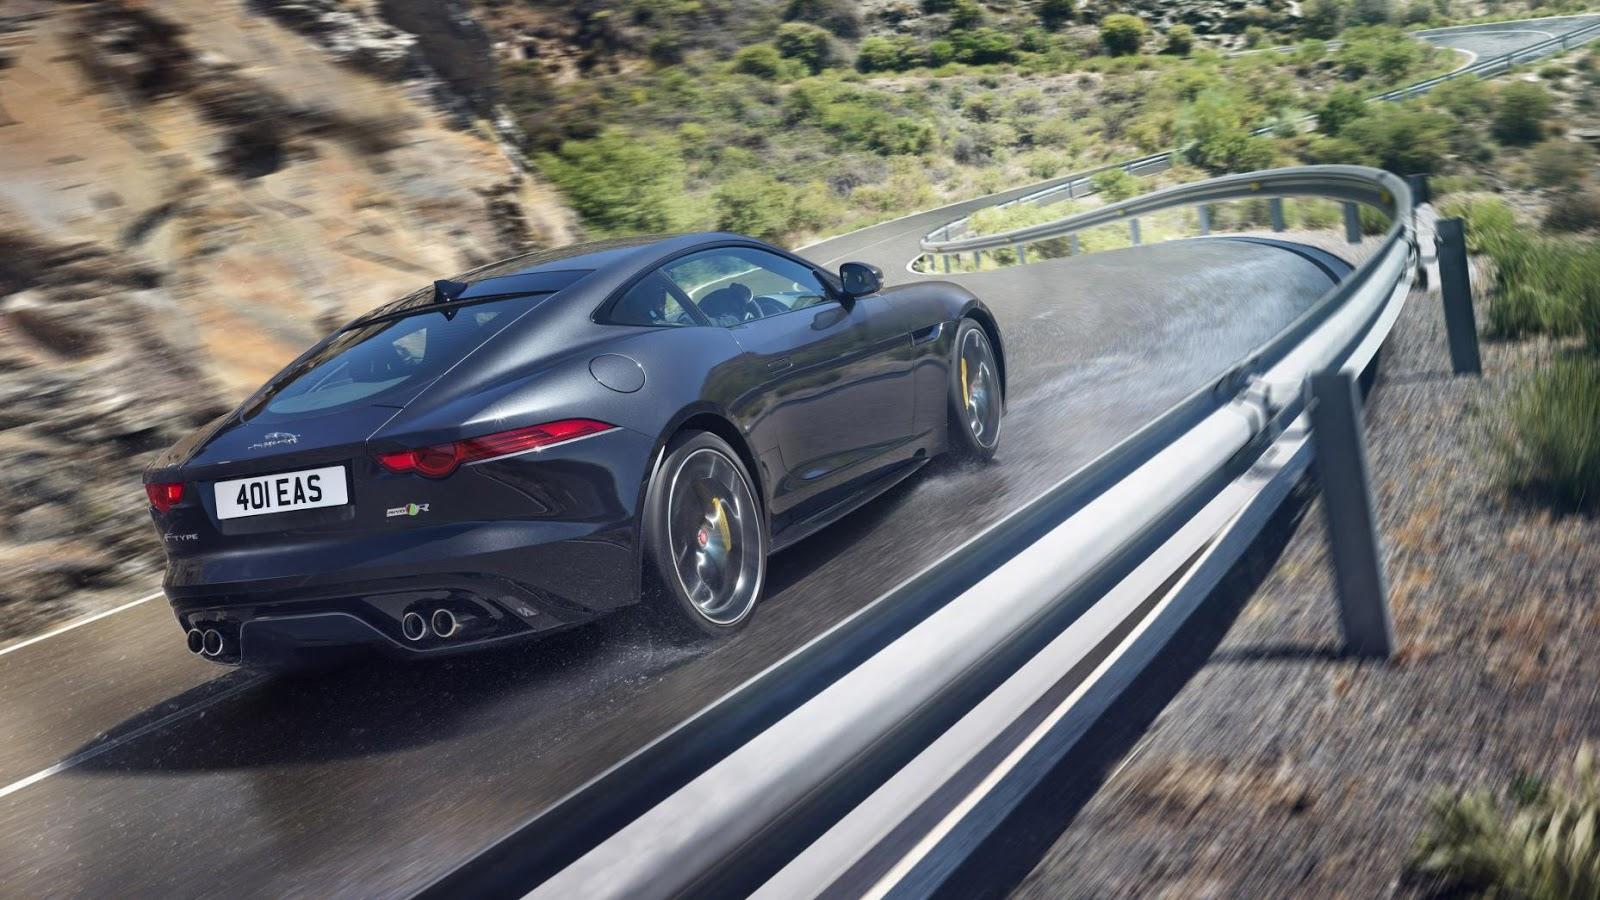 Jaguar F-Type R Coupe AWD - tăng tốc từ 0 - 100 km/h trong 4.1secs